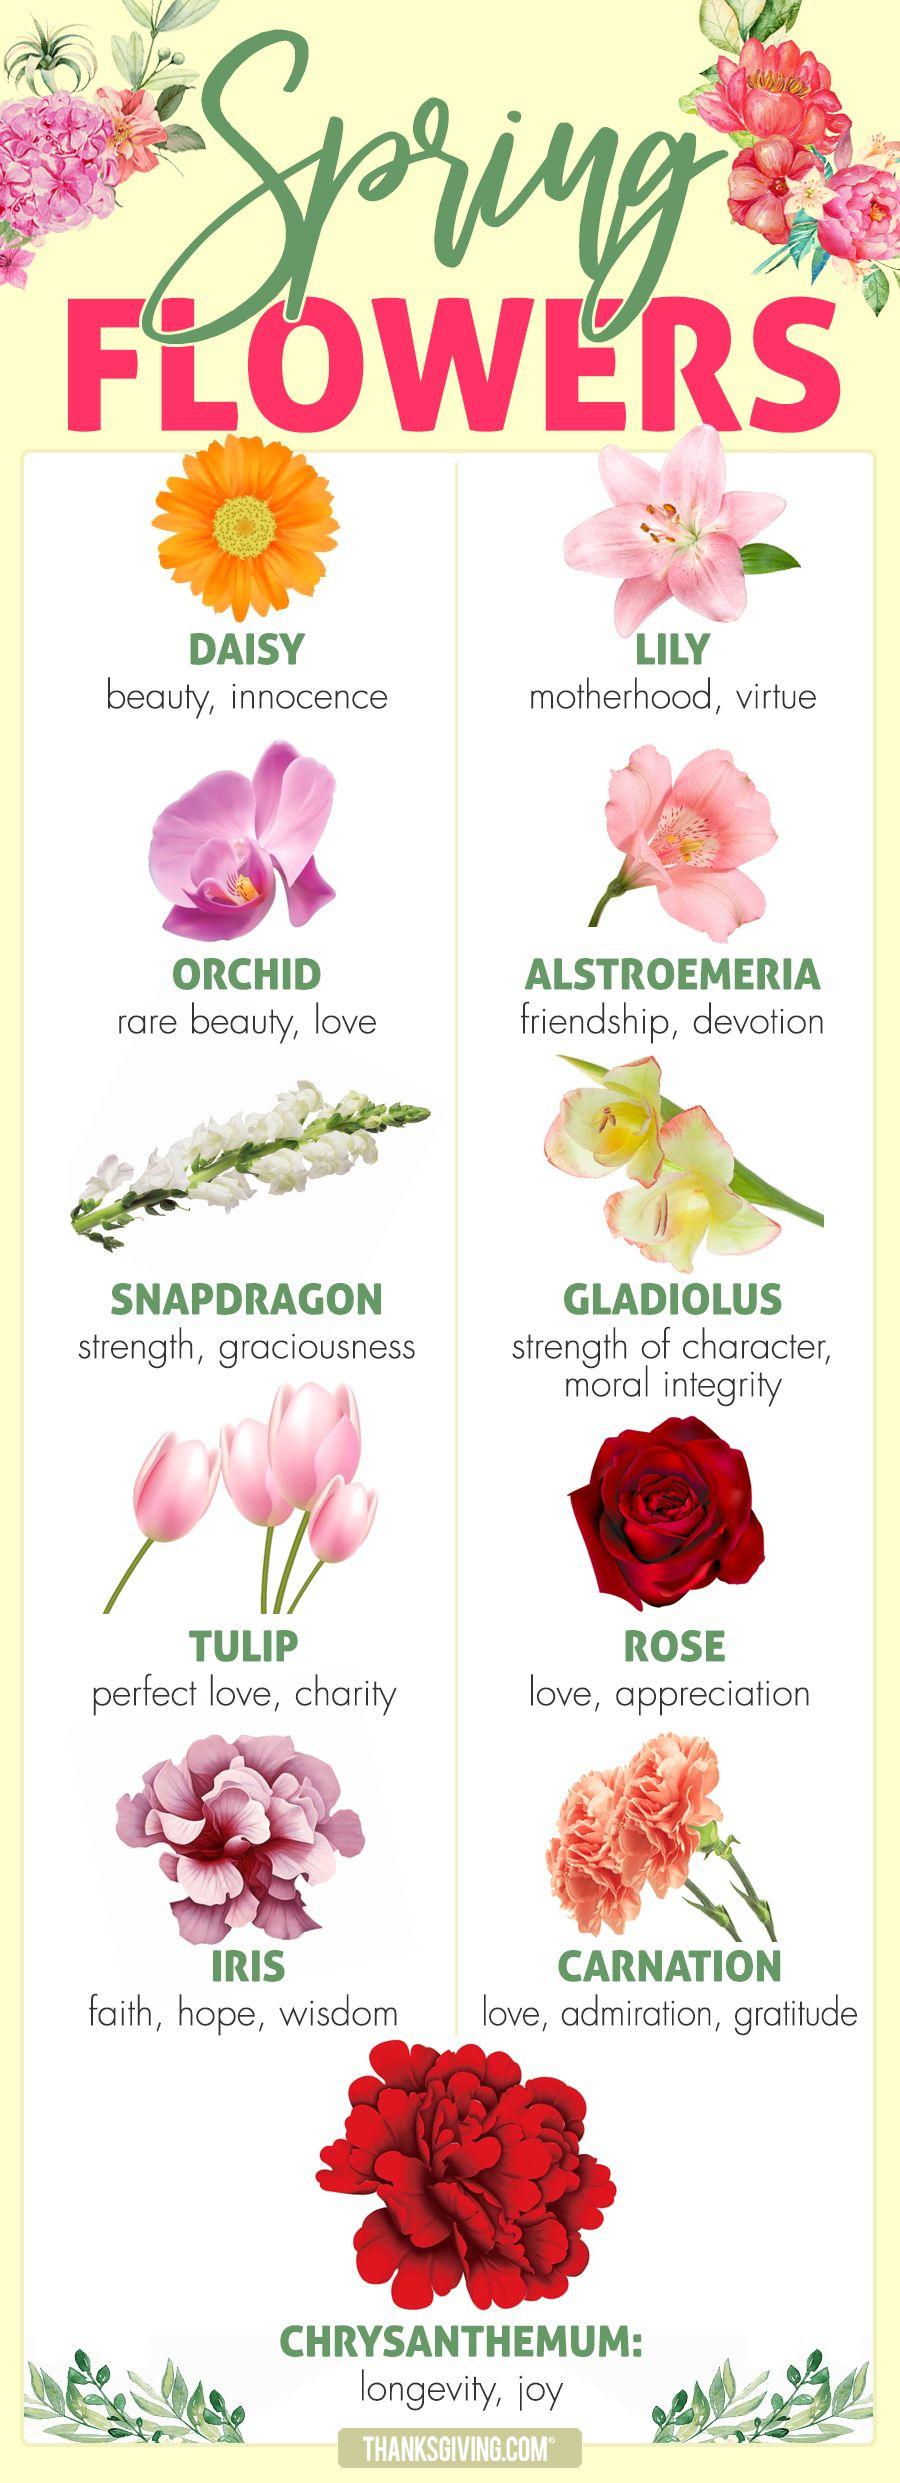 Beauty Love Hope More Spring Flower Meanings Flower Tattoo Meanings Spring Flowers Flower Meanings